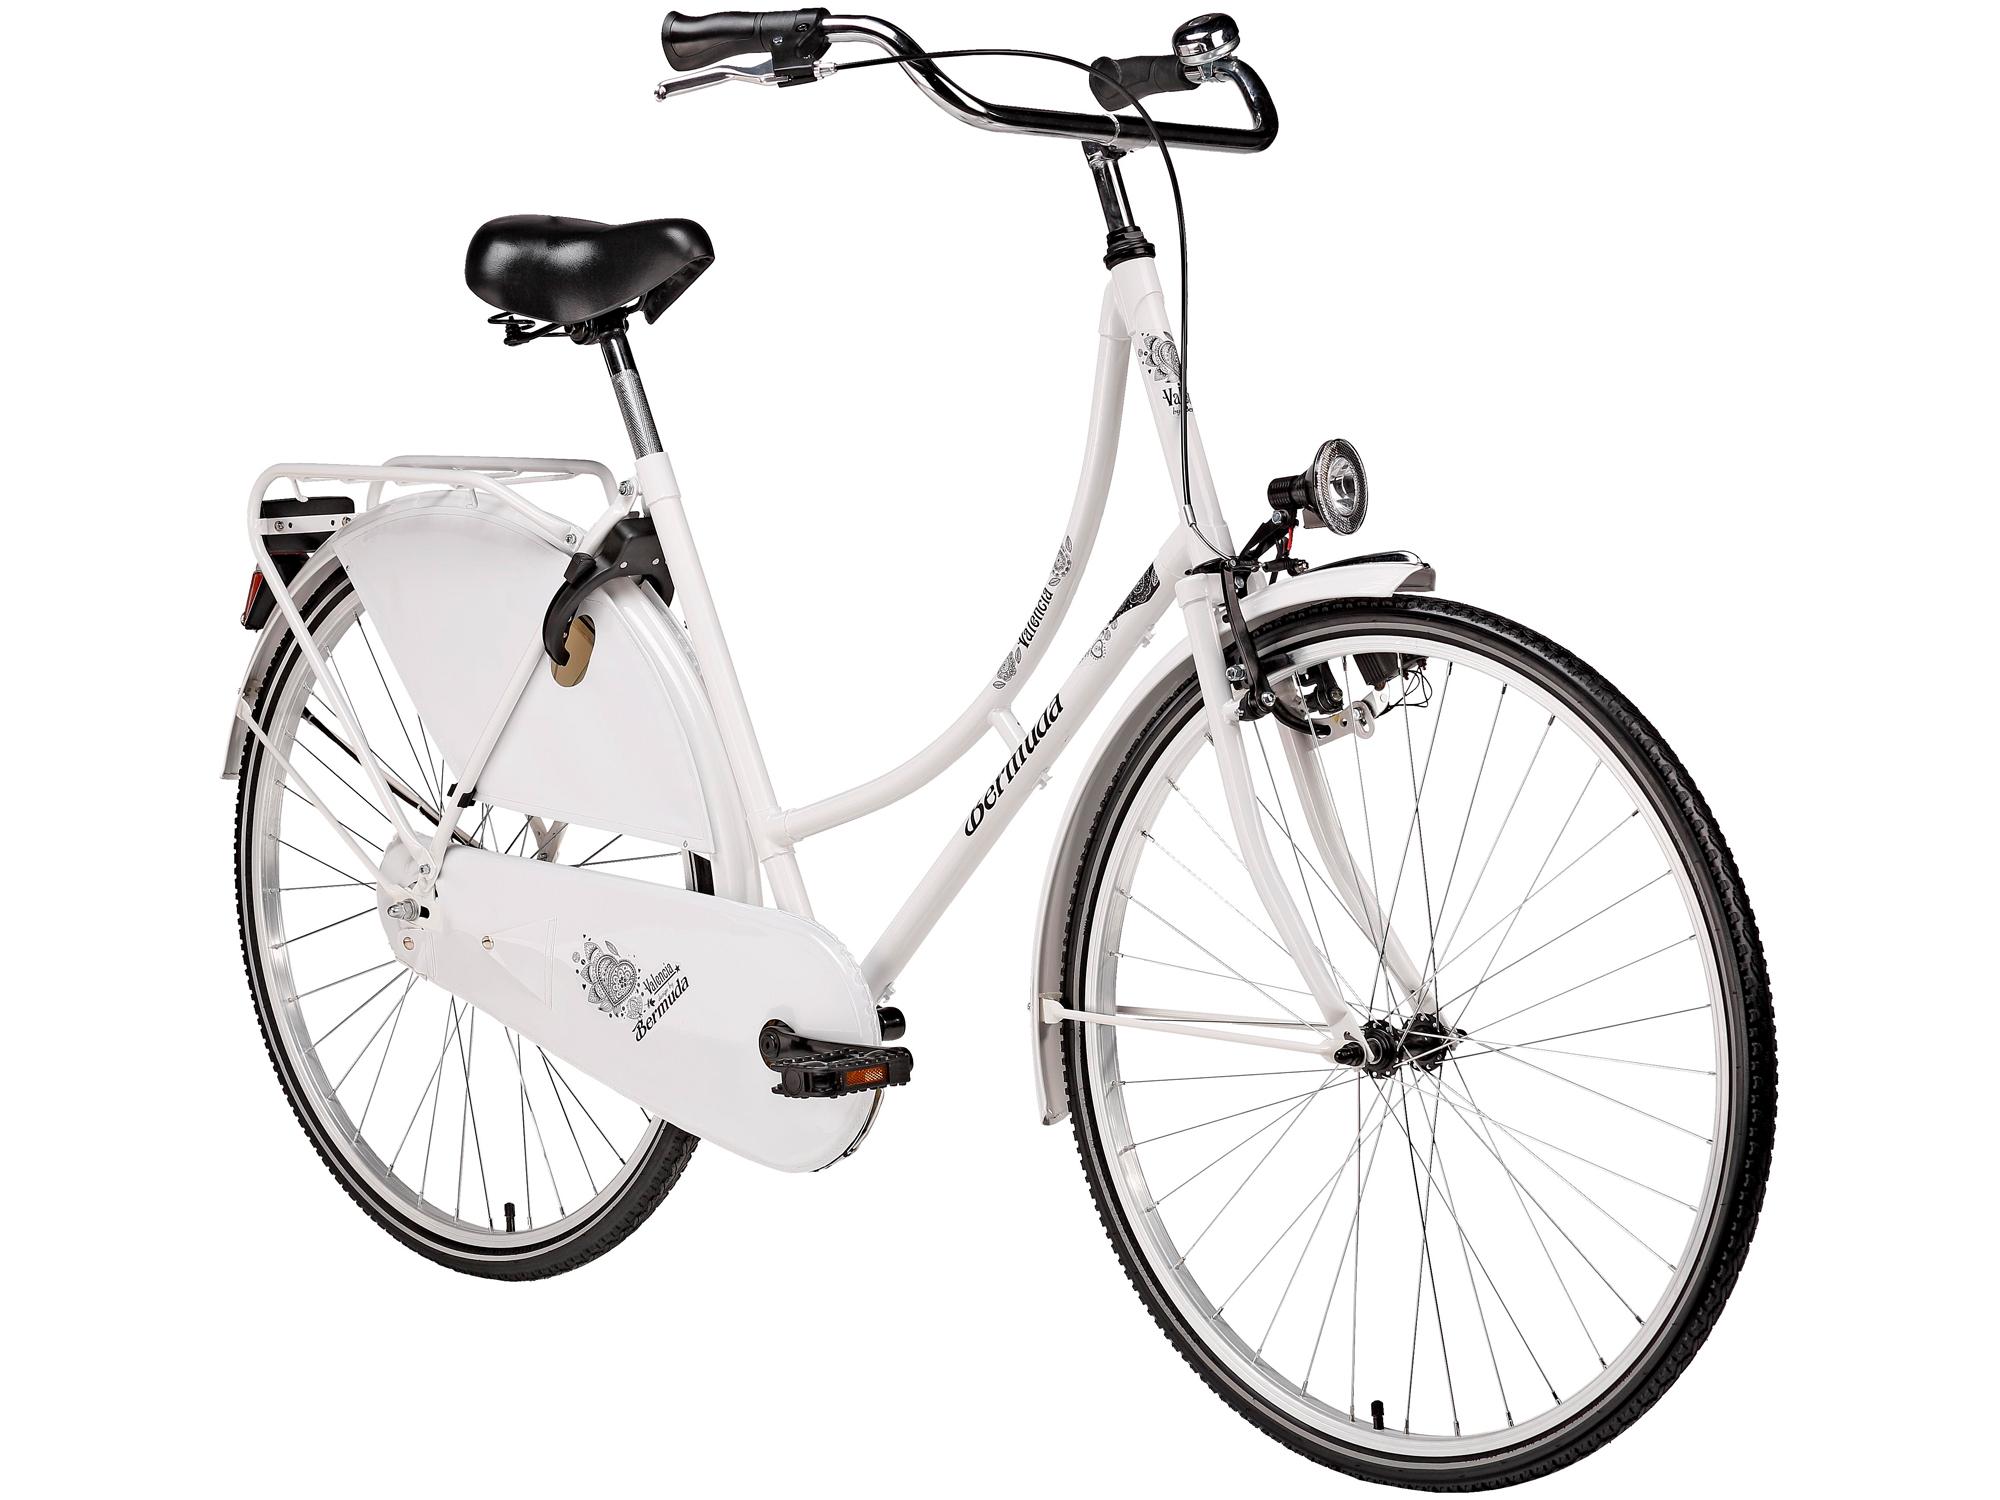 hollandrad damen bermuda weiss g nstig kaufen bikes4less. Black Bedroom Furniture Sets. Home Design Ideas